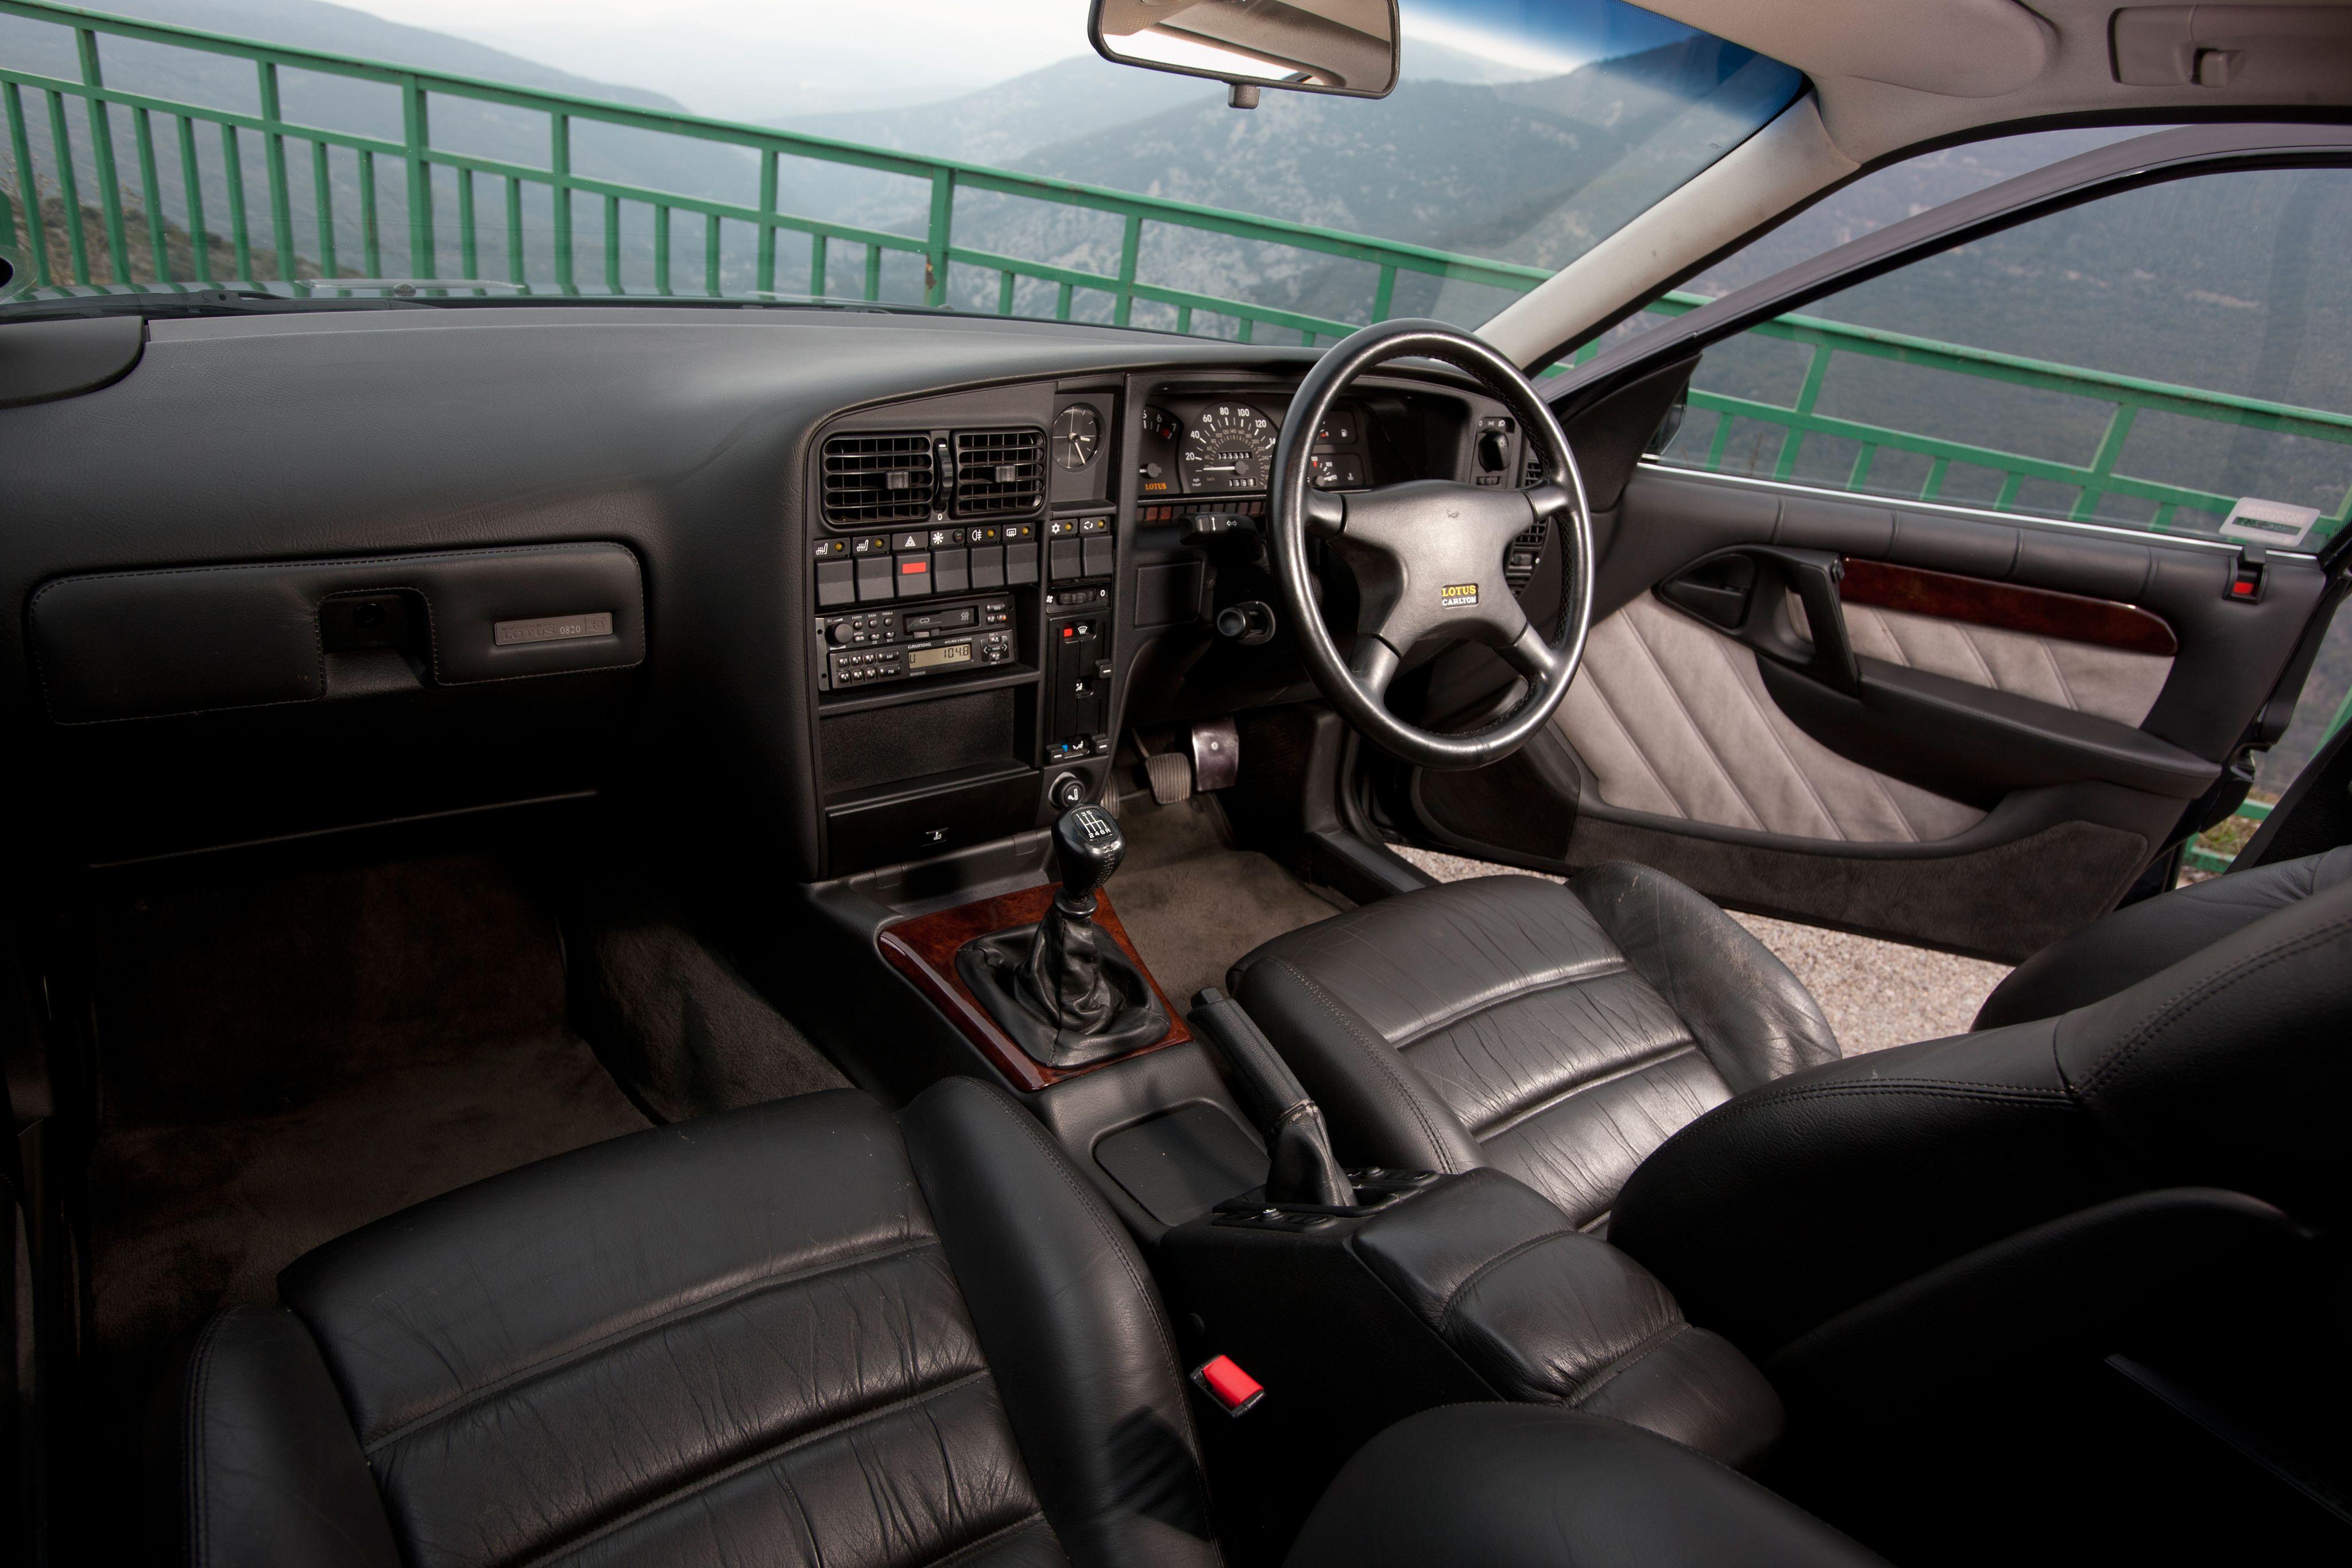 1990 Vauxhall Lotus Carlton Vauxhall Opel Car Interior